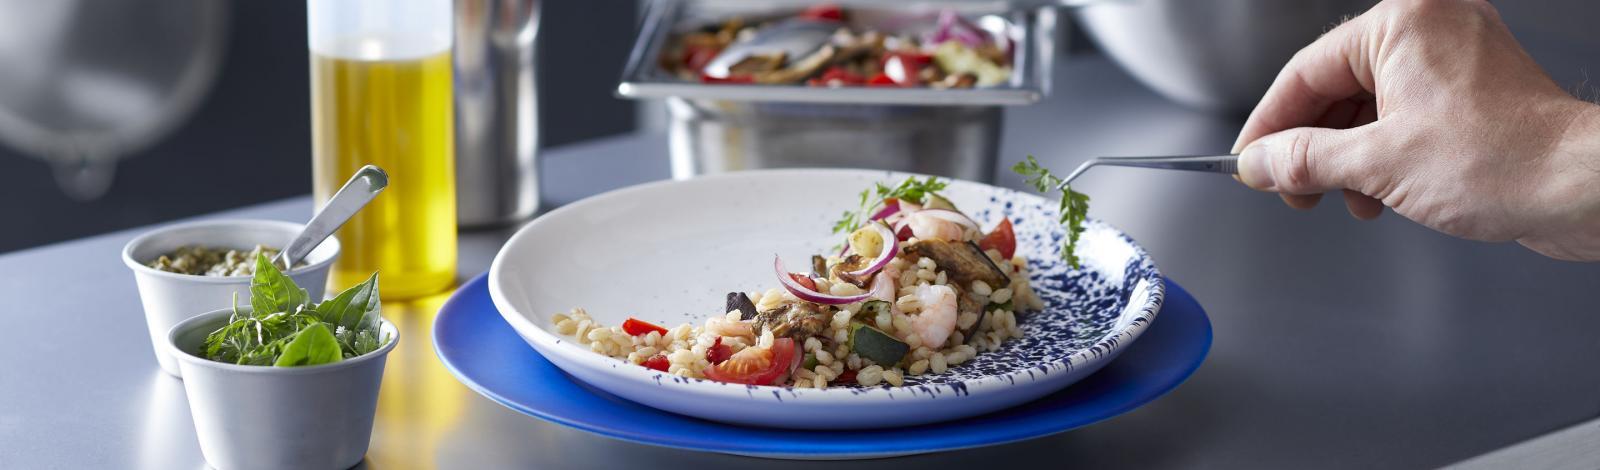 Salade d'orge perlé